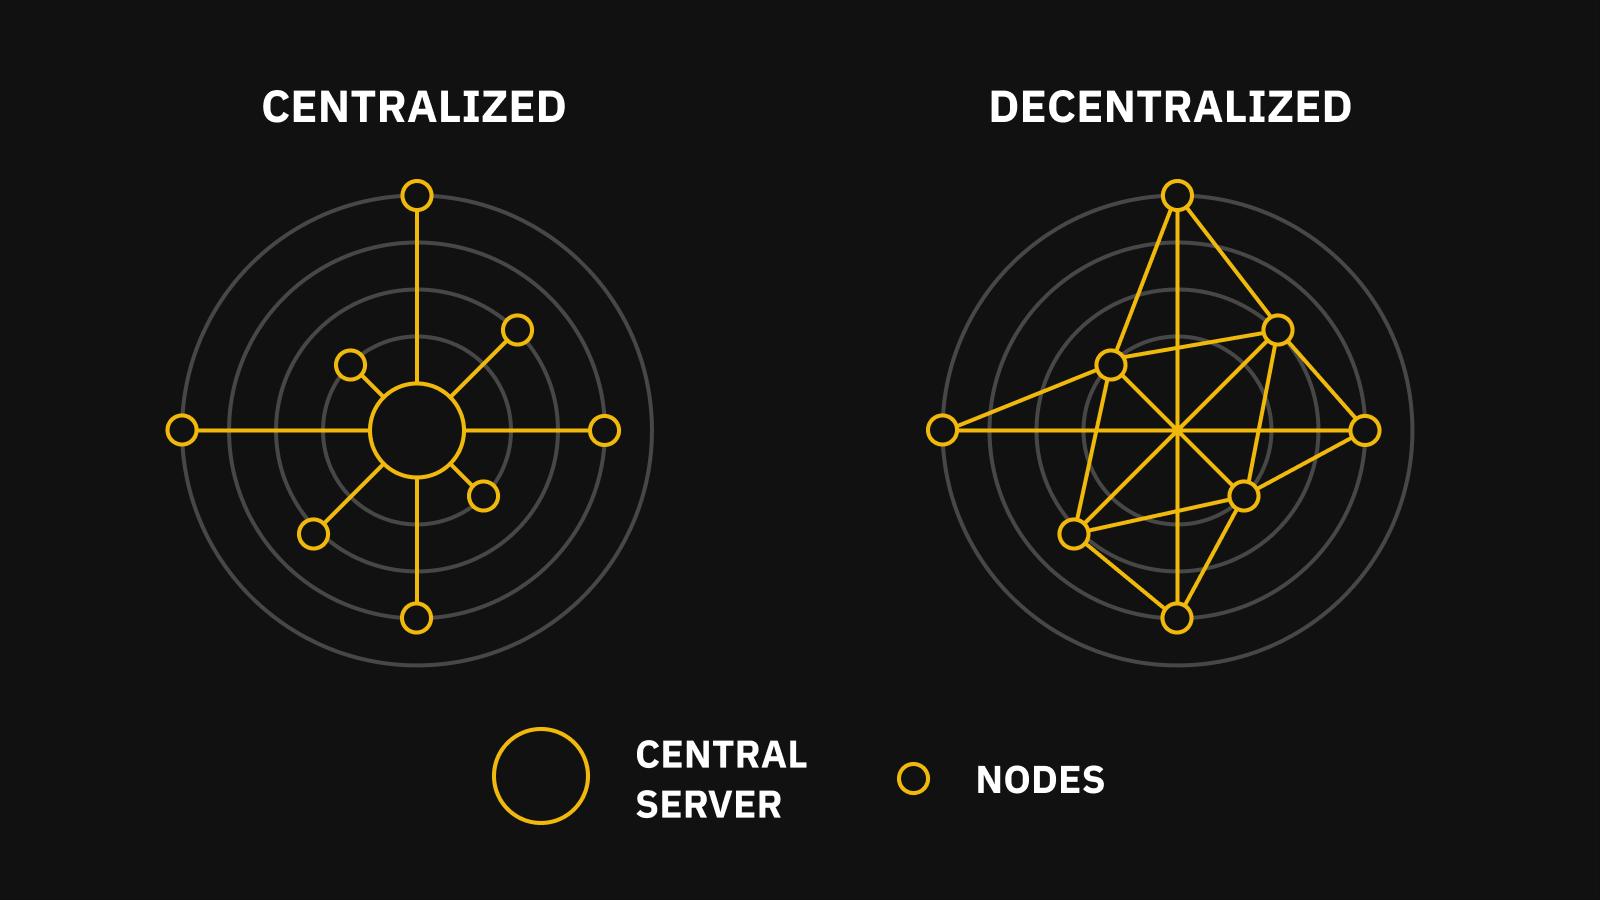 centralized-vs-decentralized-networks